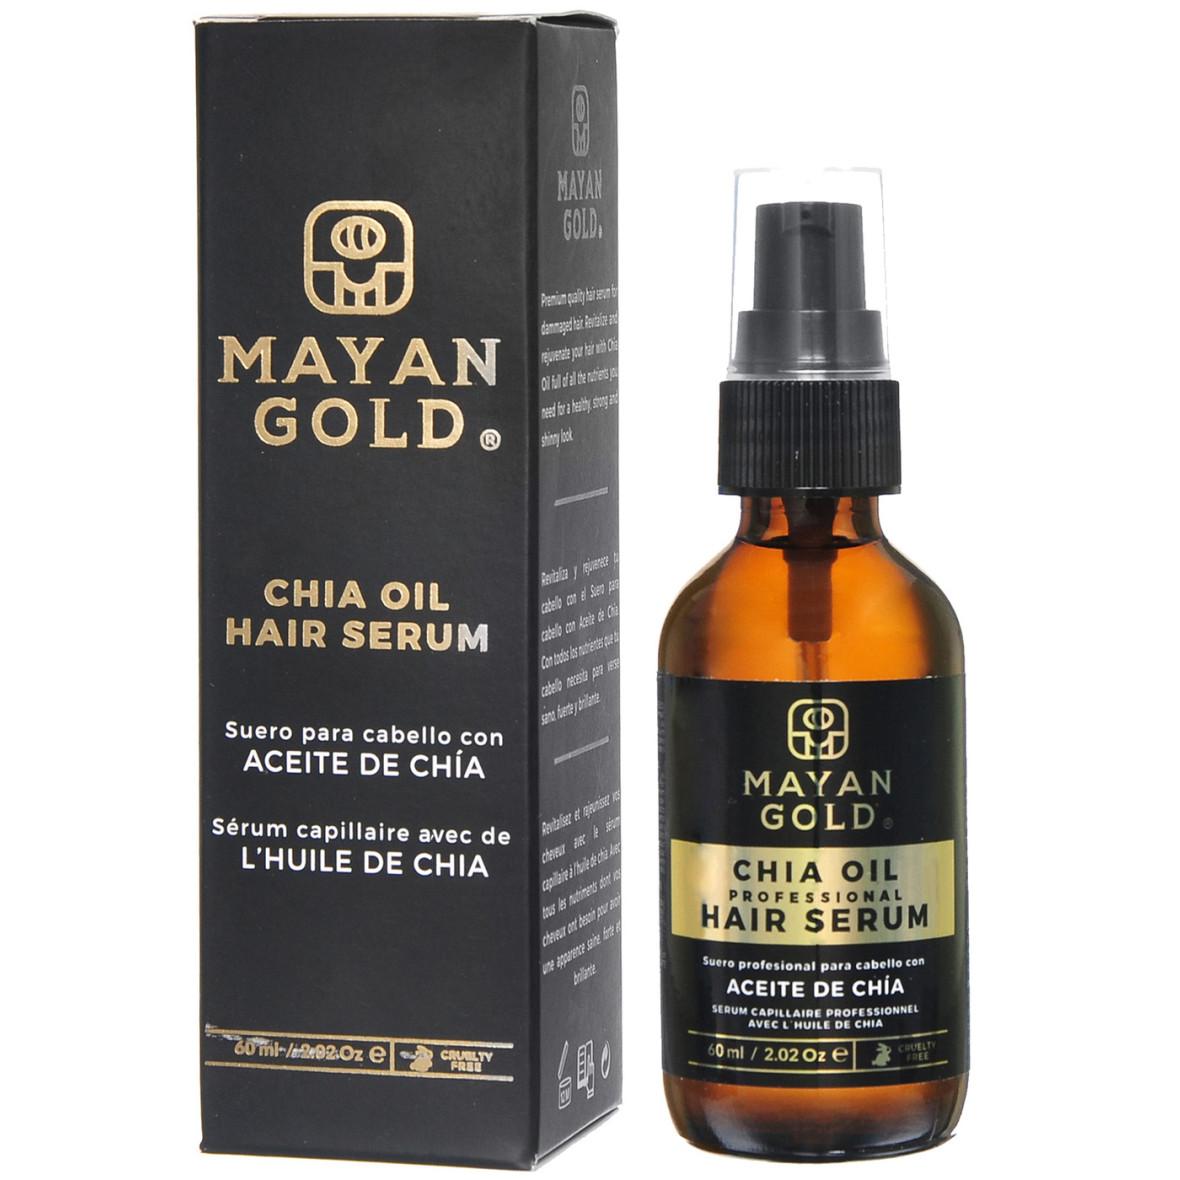 Mayan Gold Chia Oil Hair Serum 60ml Beautyx Ee